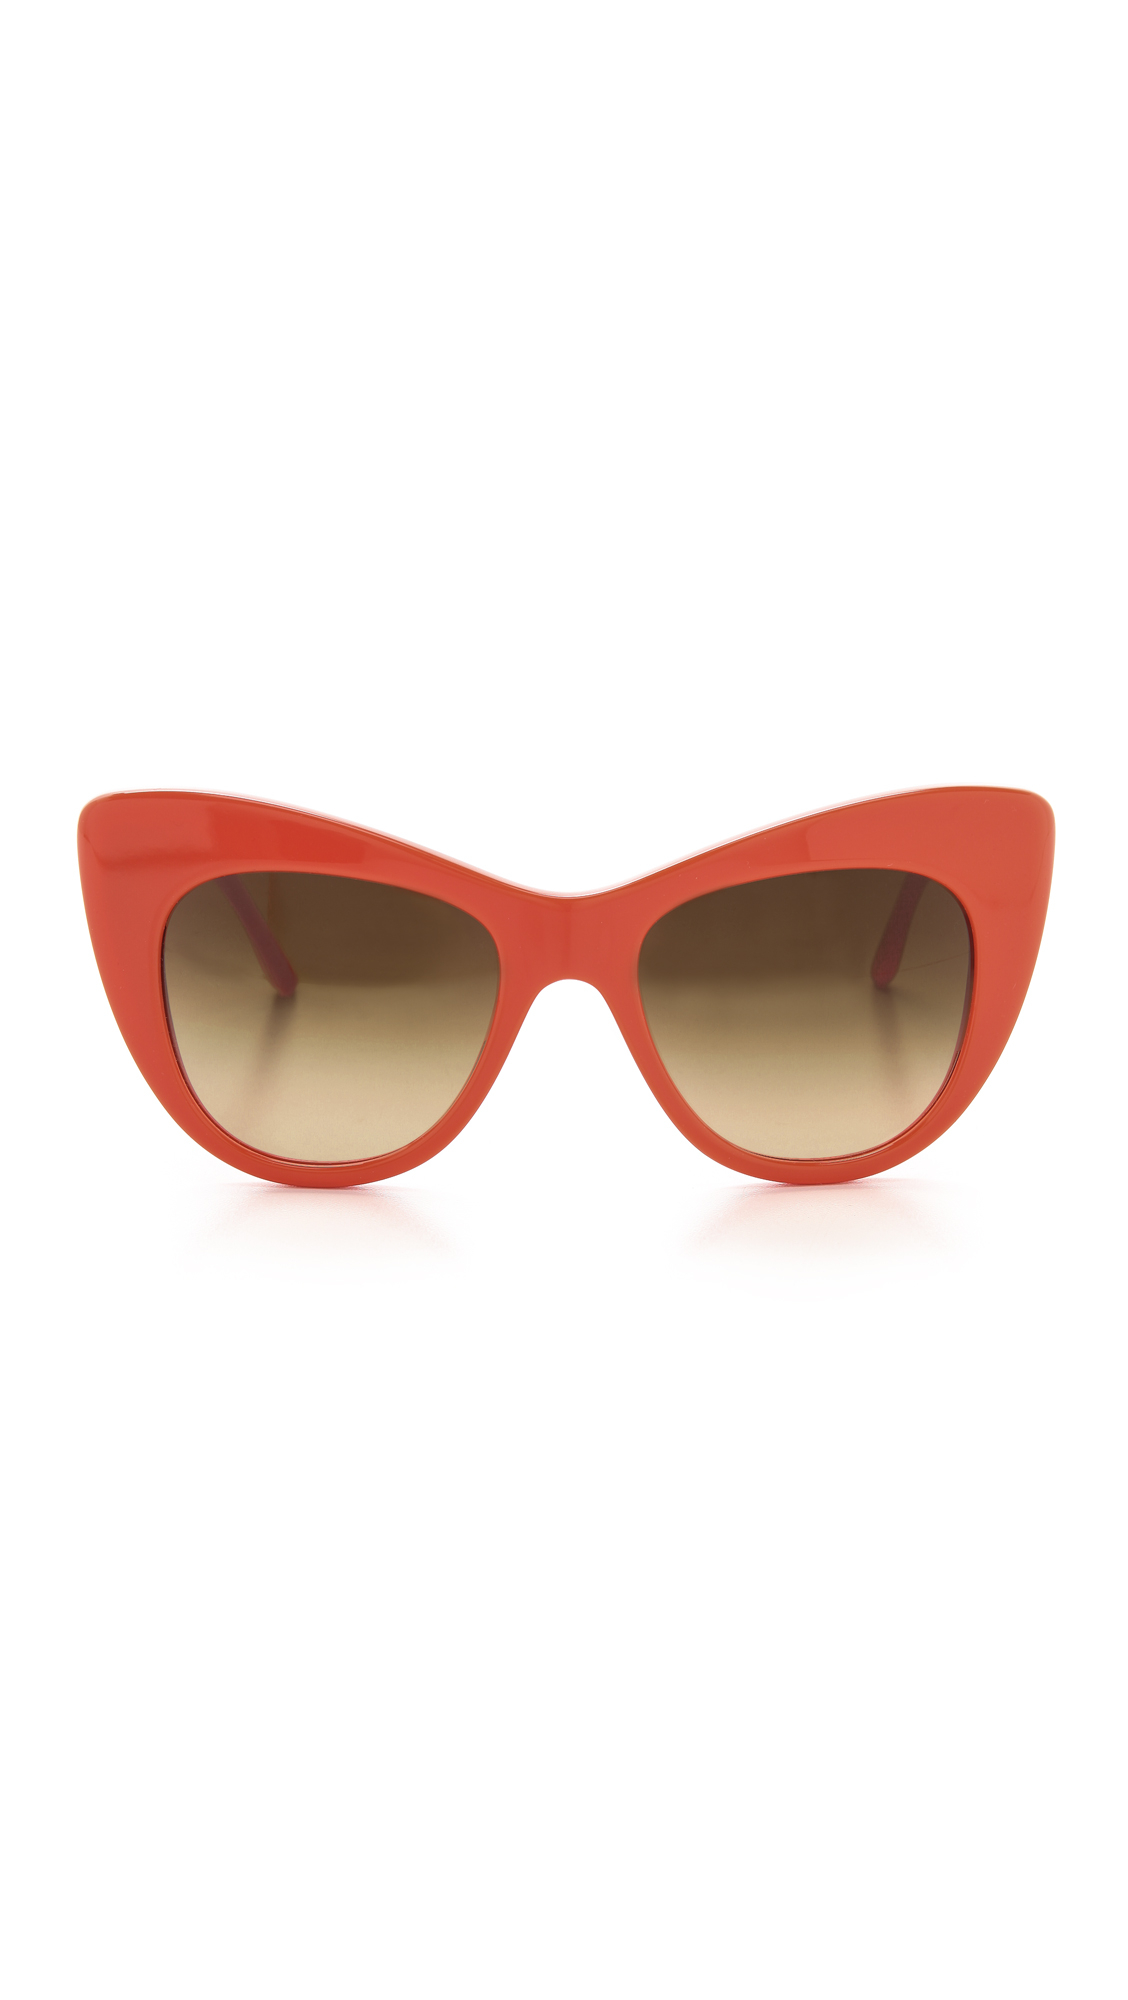 416573d4c3a Lyst - Stella McCartney Cat Eye Sunglasses Bright Orangered in Red